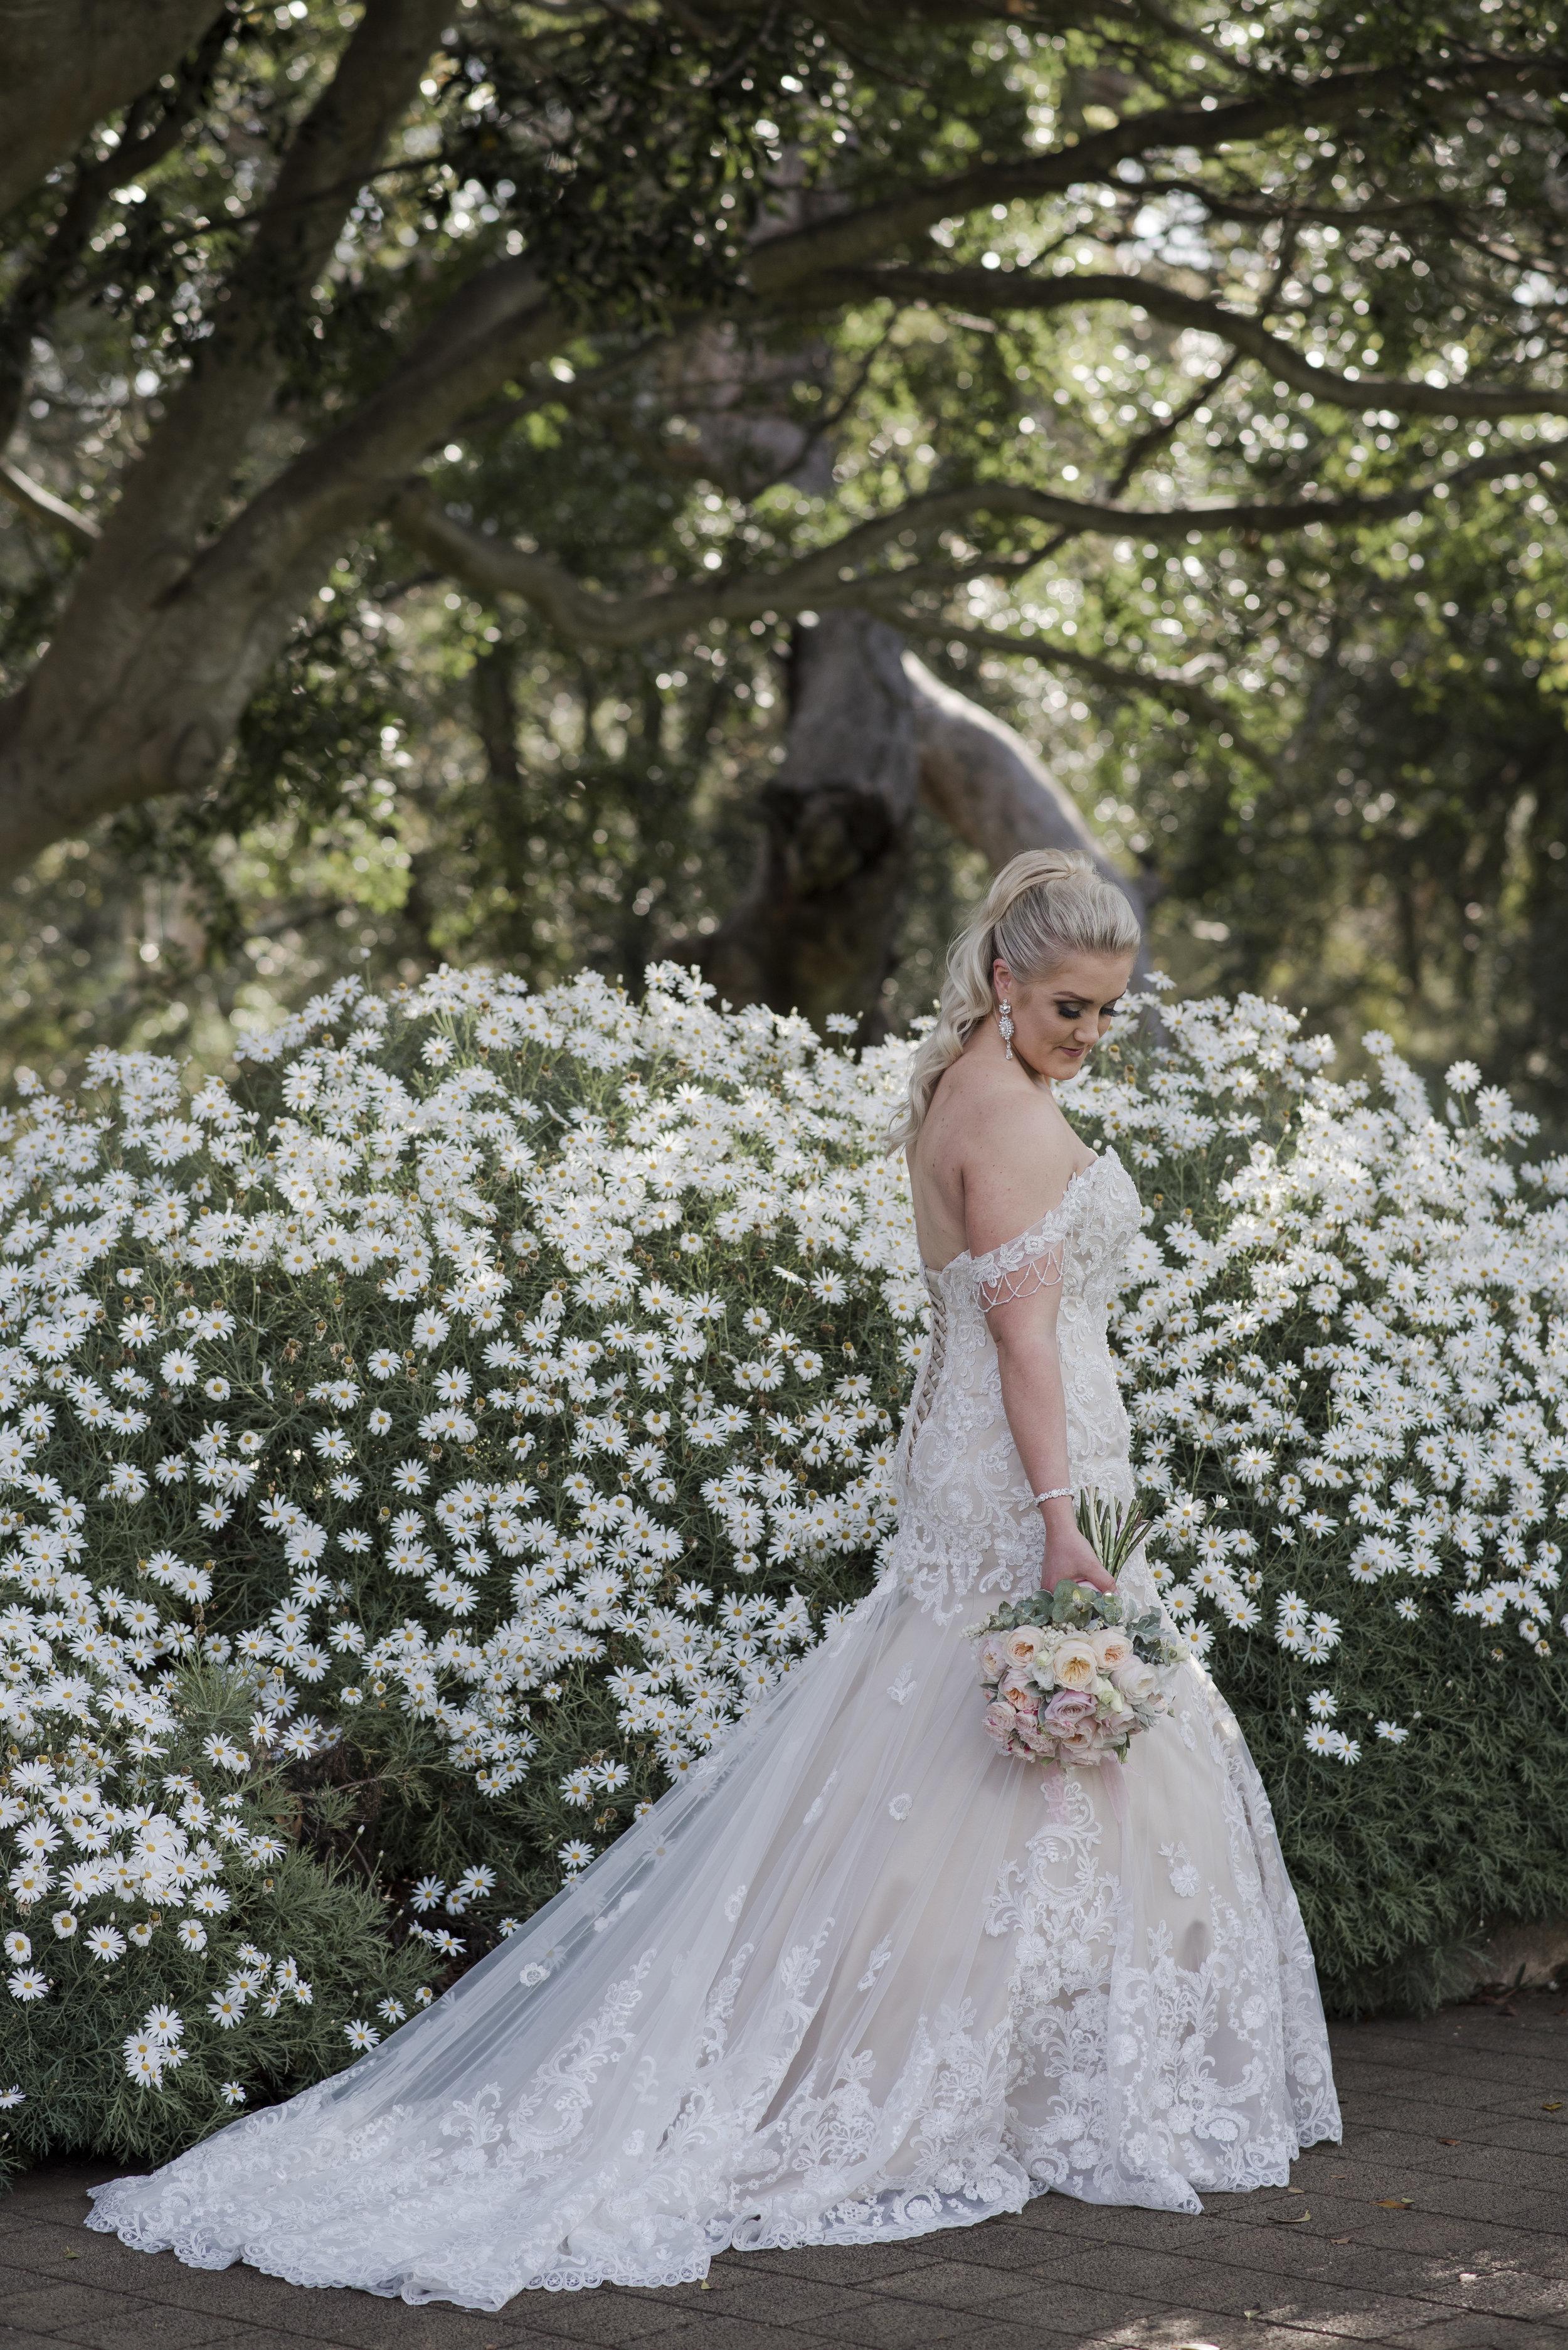 Teagan_Mayflower Weddings Photography_051.jpg